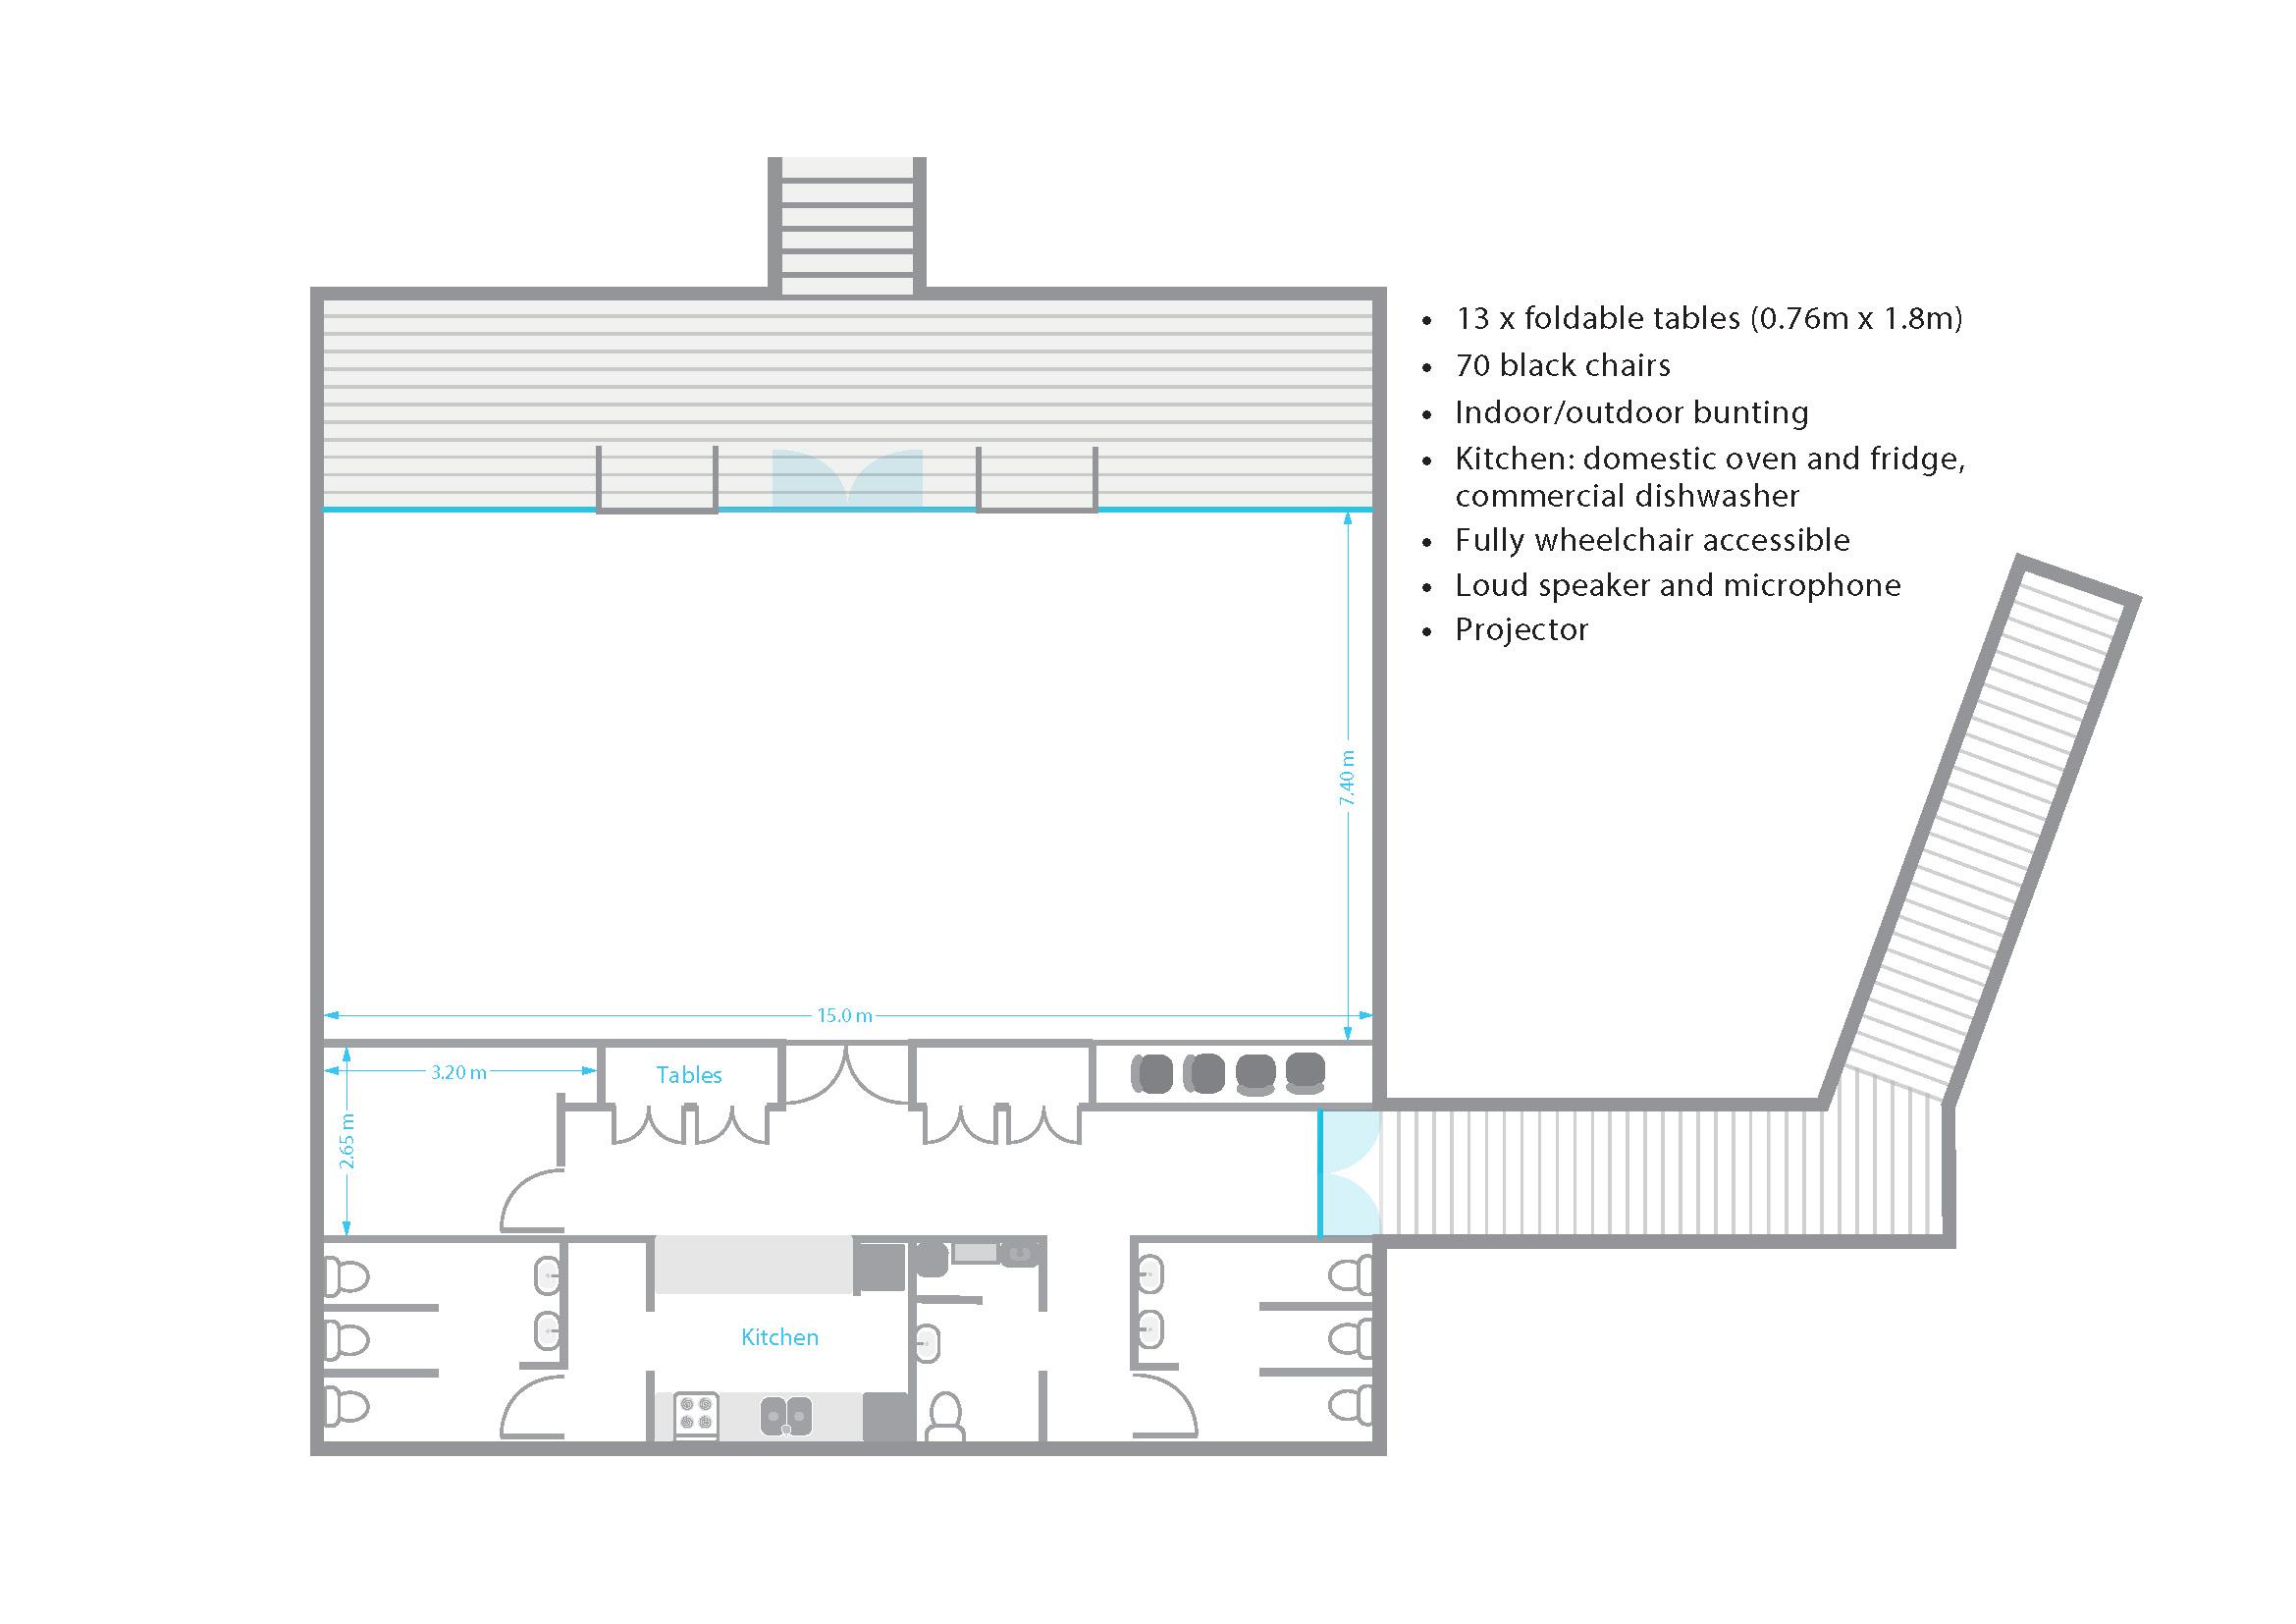 Stillwater Hall Floor Plan. Click to enlarge image.